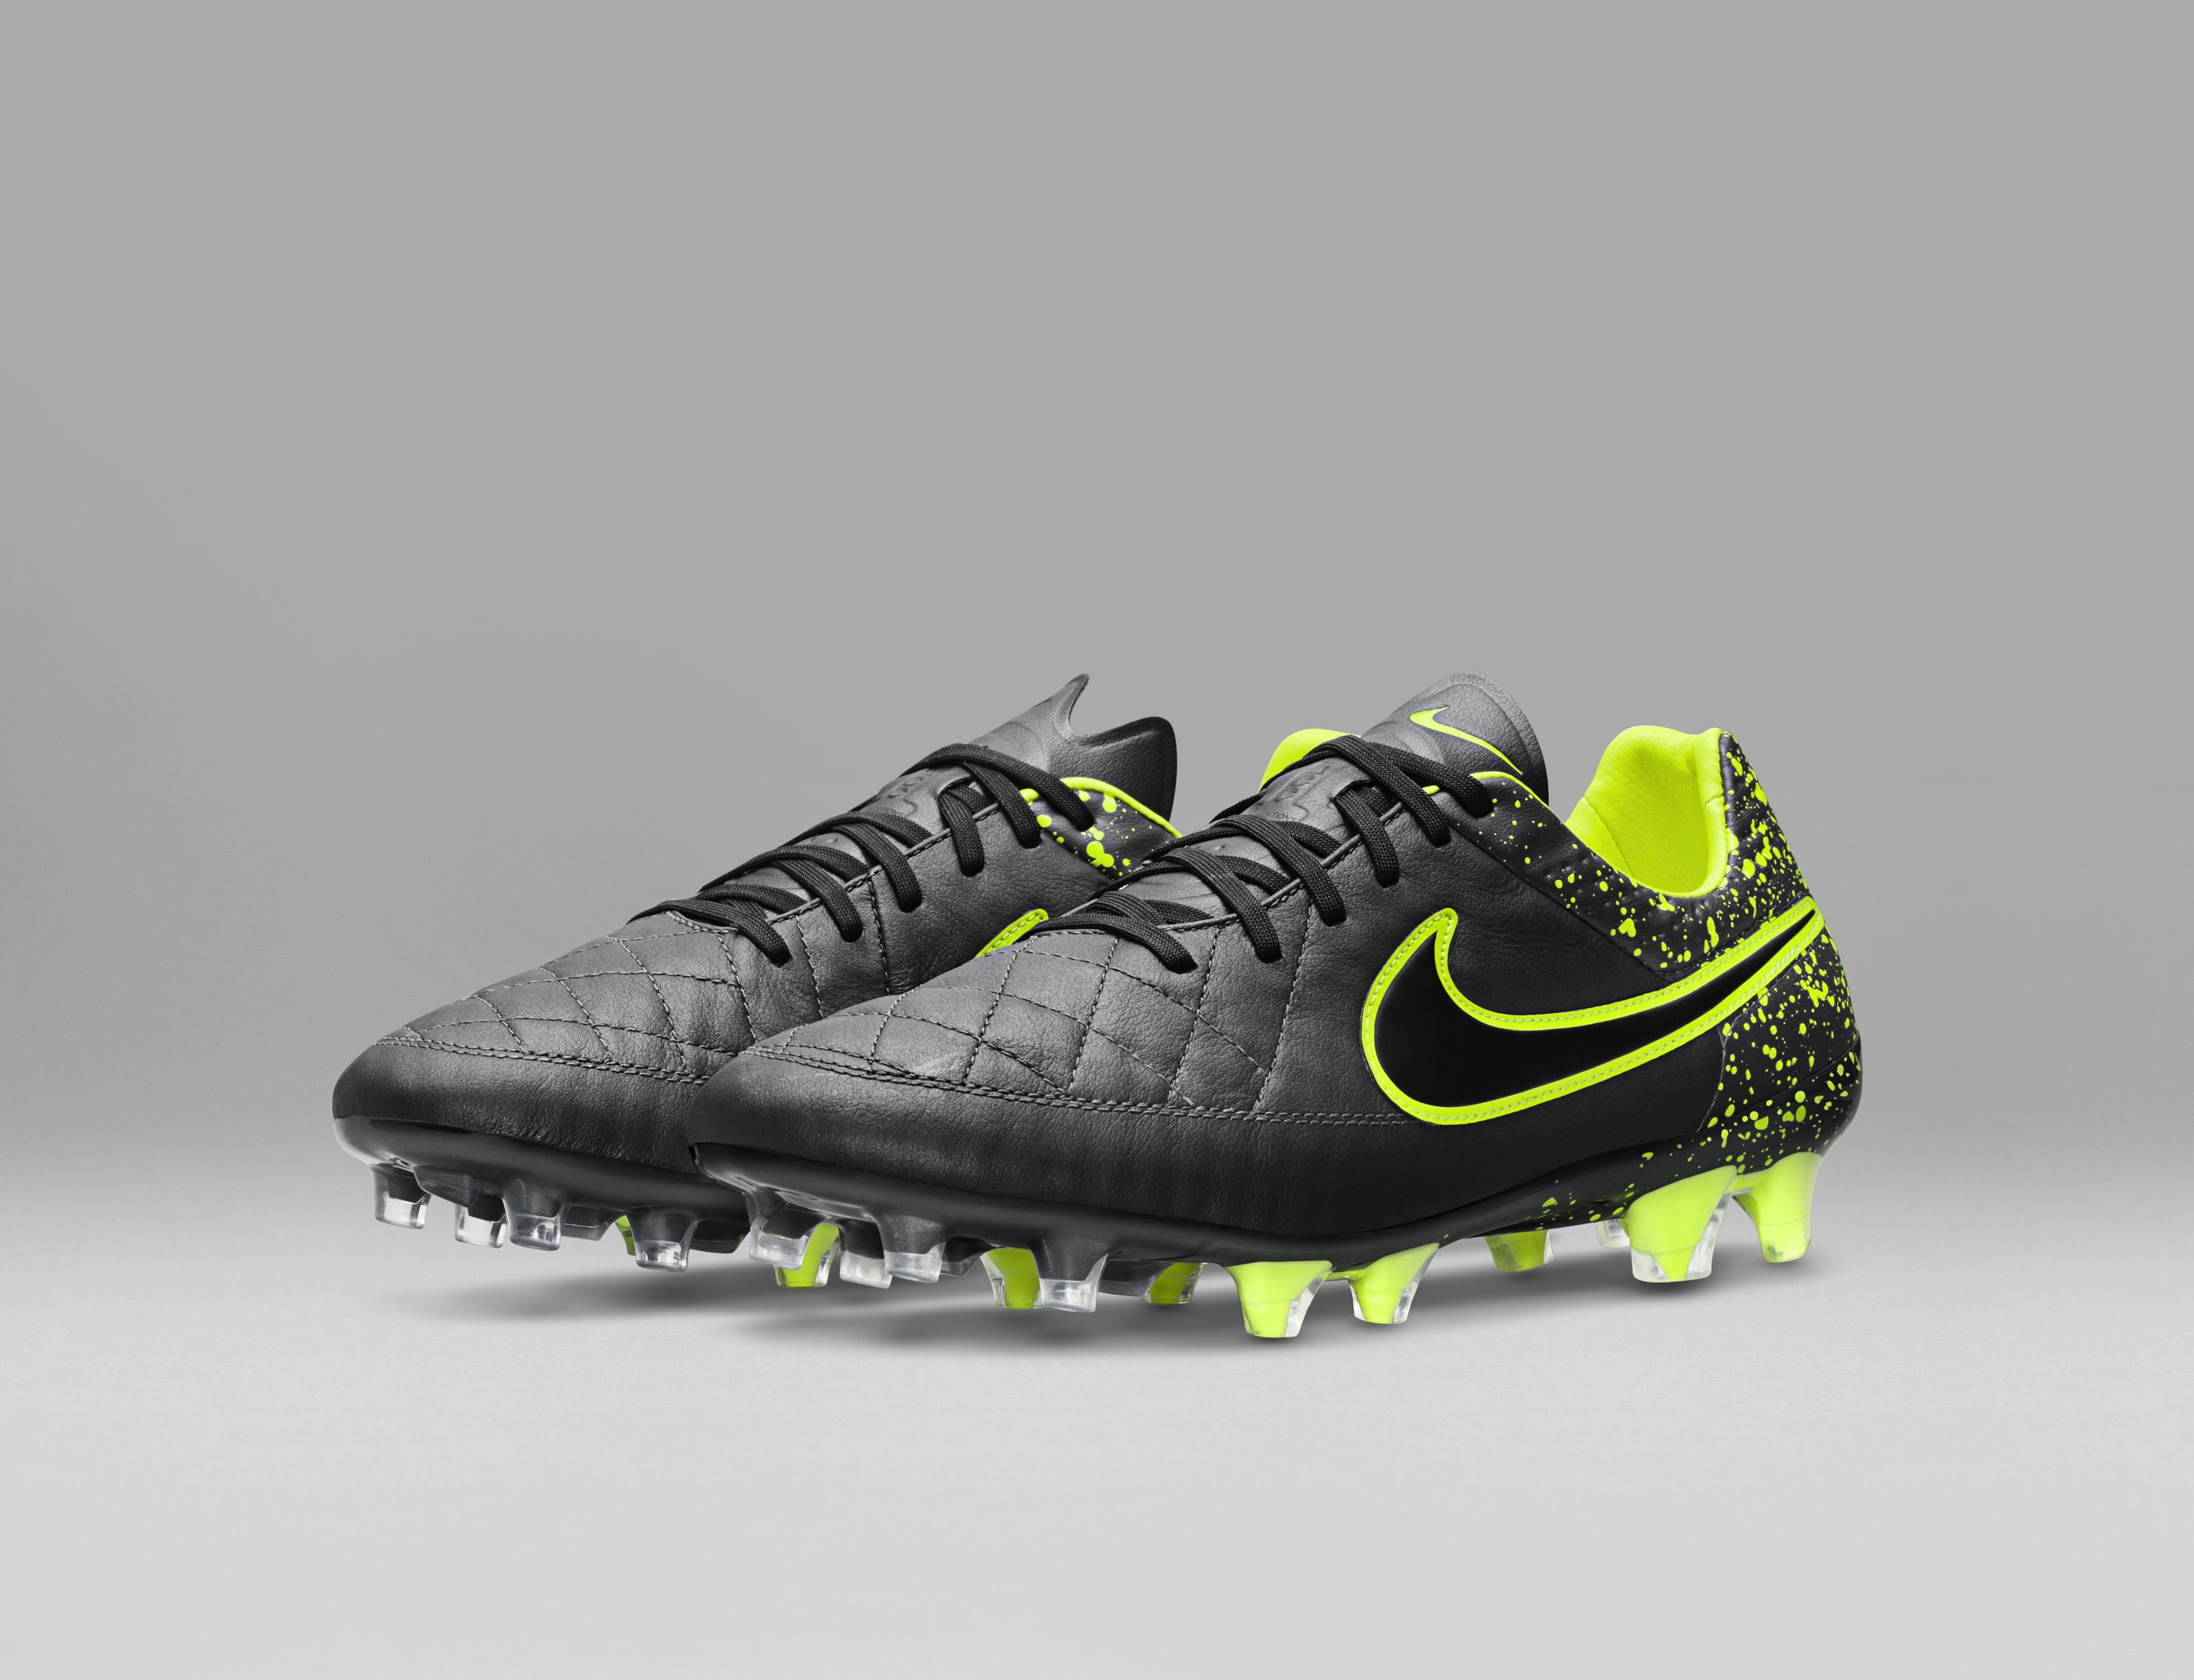 Nike Mercurial Nere E Gialle